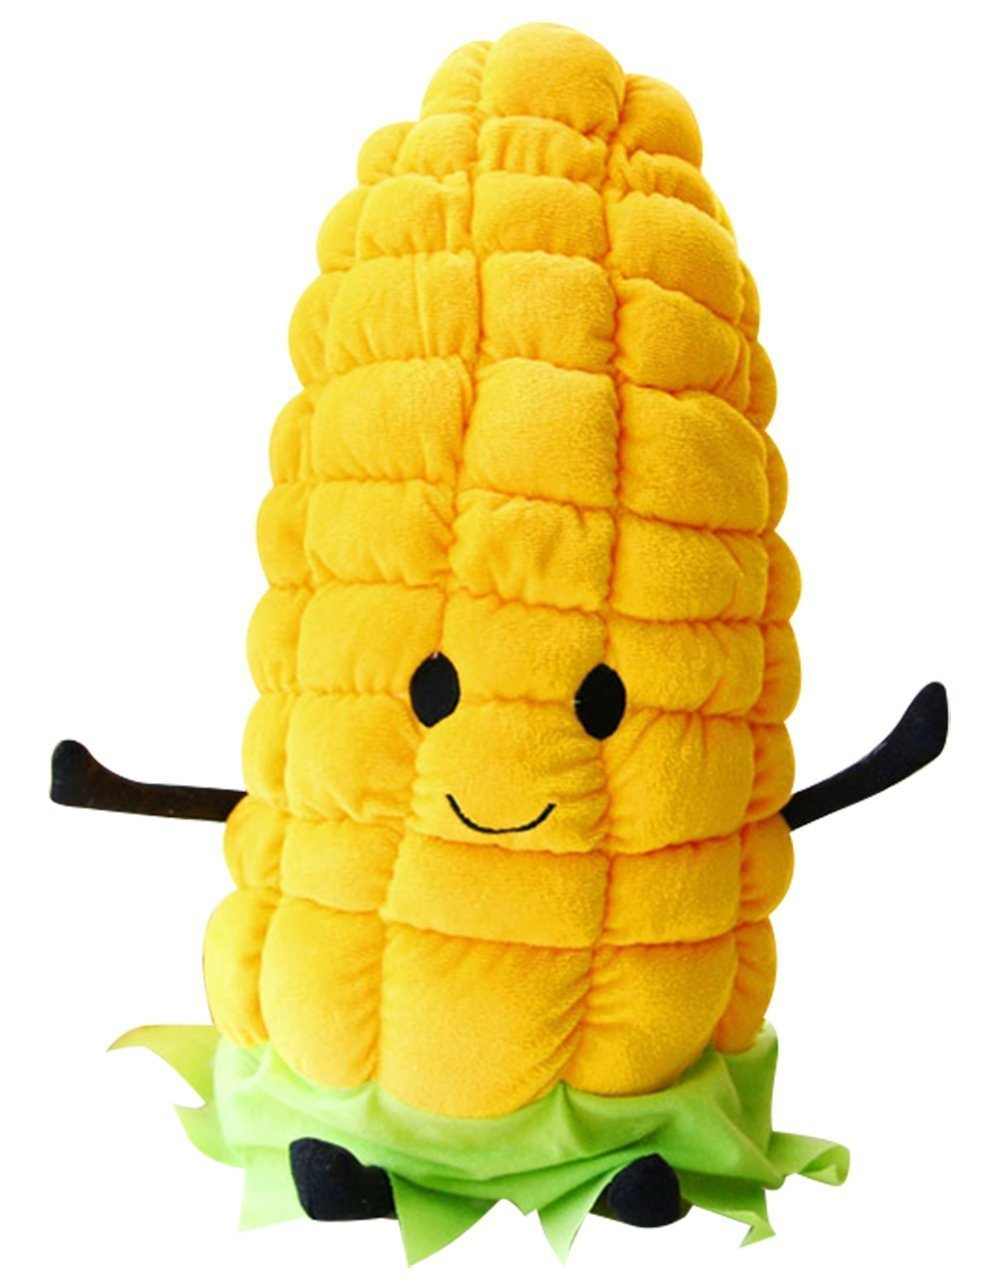 Corn Pillow Plush Toy Vegetable Shaped Doll for Girl and Children Thanksgiving Christmas Gift 23.5''